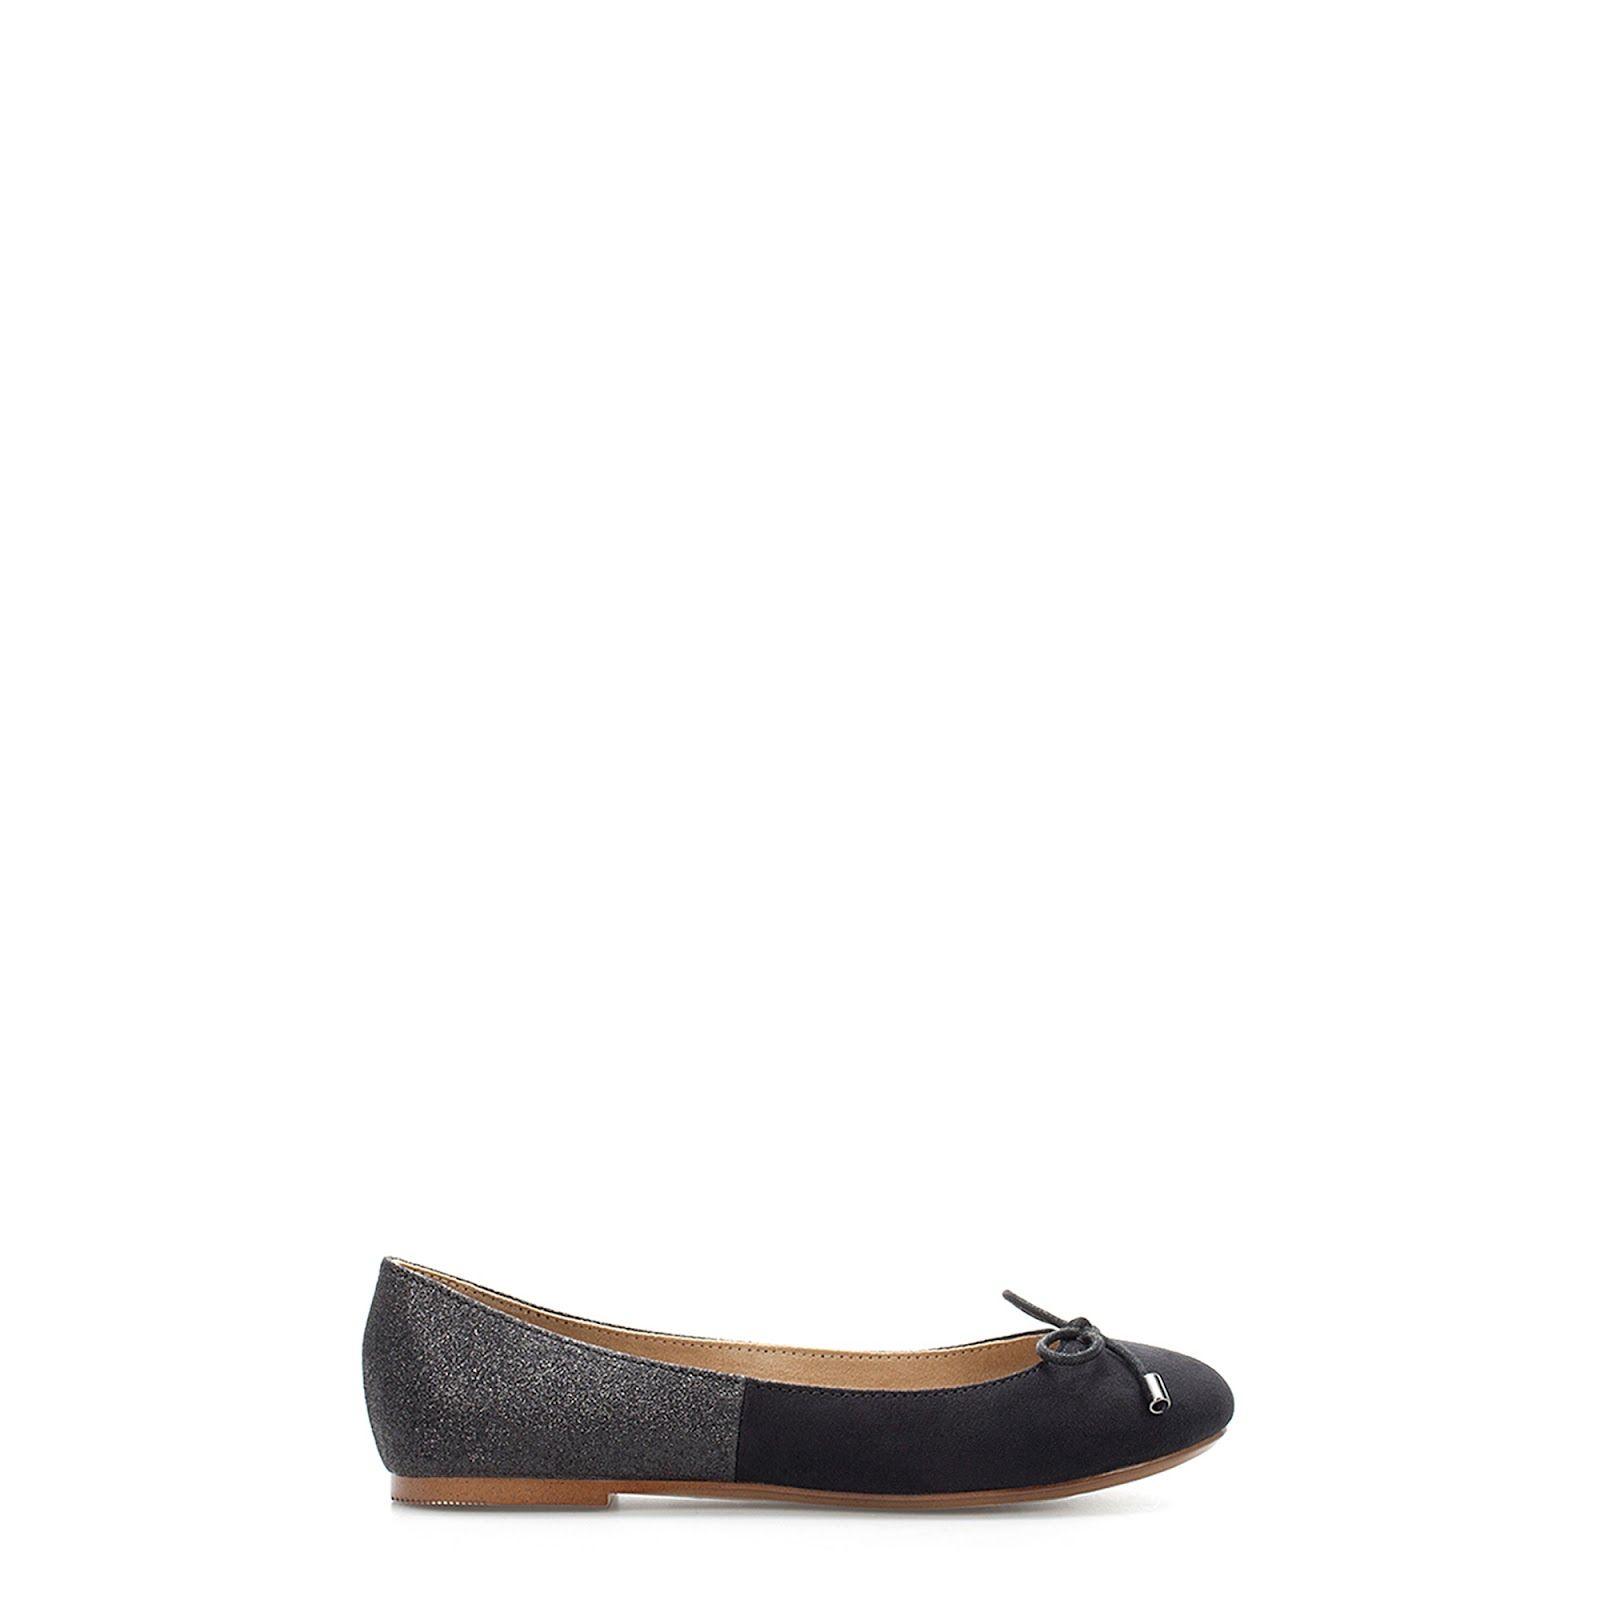 Nouvelle collection Zara Automne Hiver 2012 2013